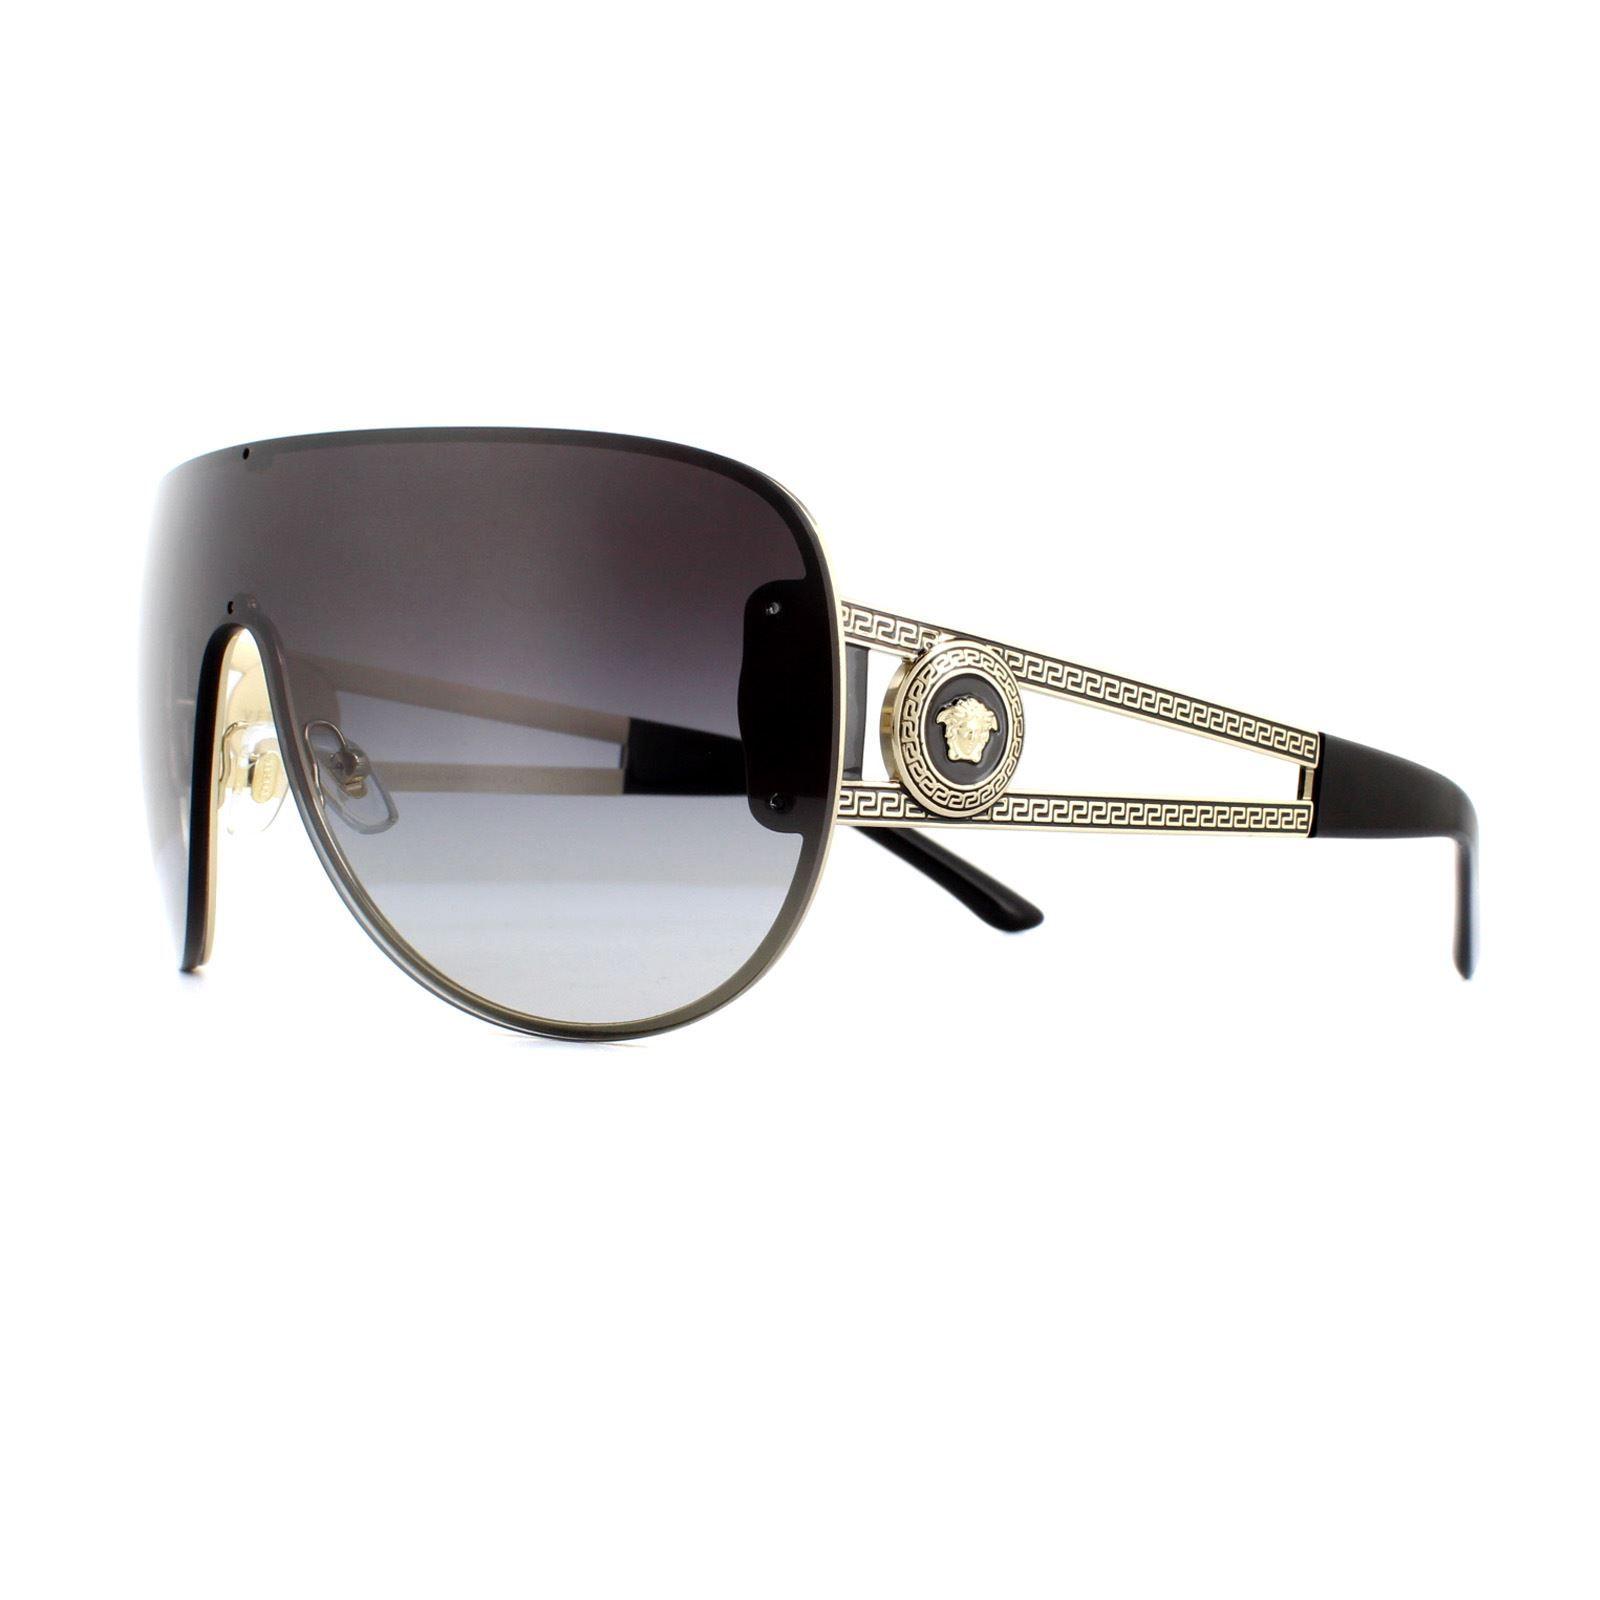 Versace Sunglasses VE2166 12528G Pale Gold Grey Gradient